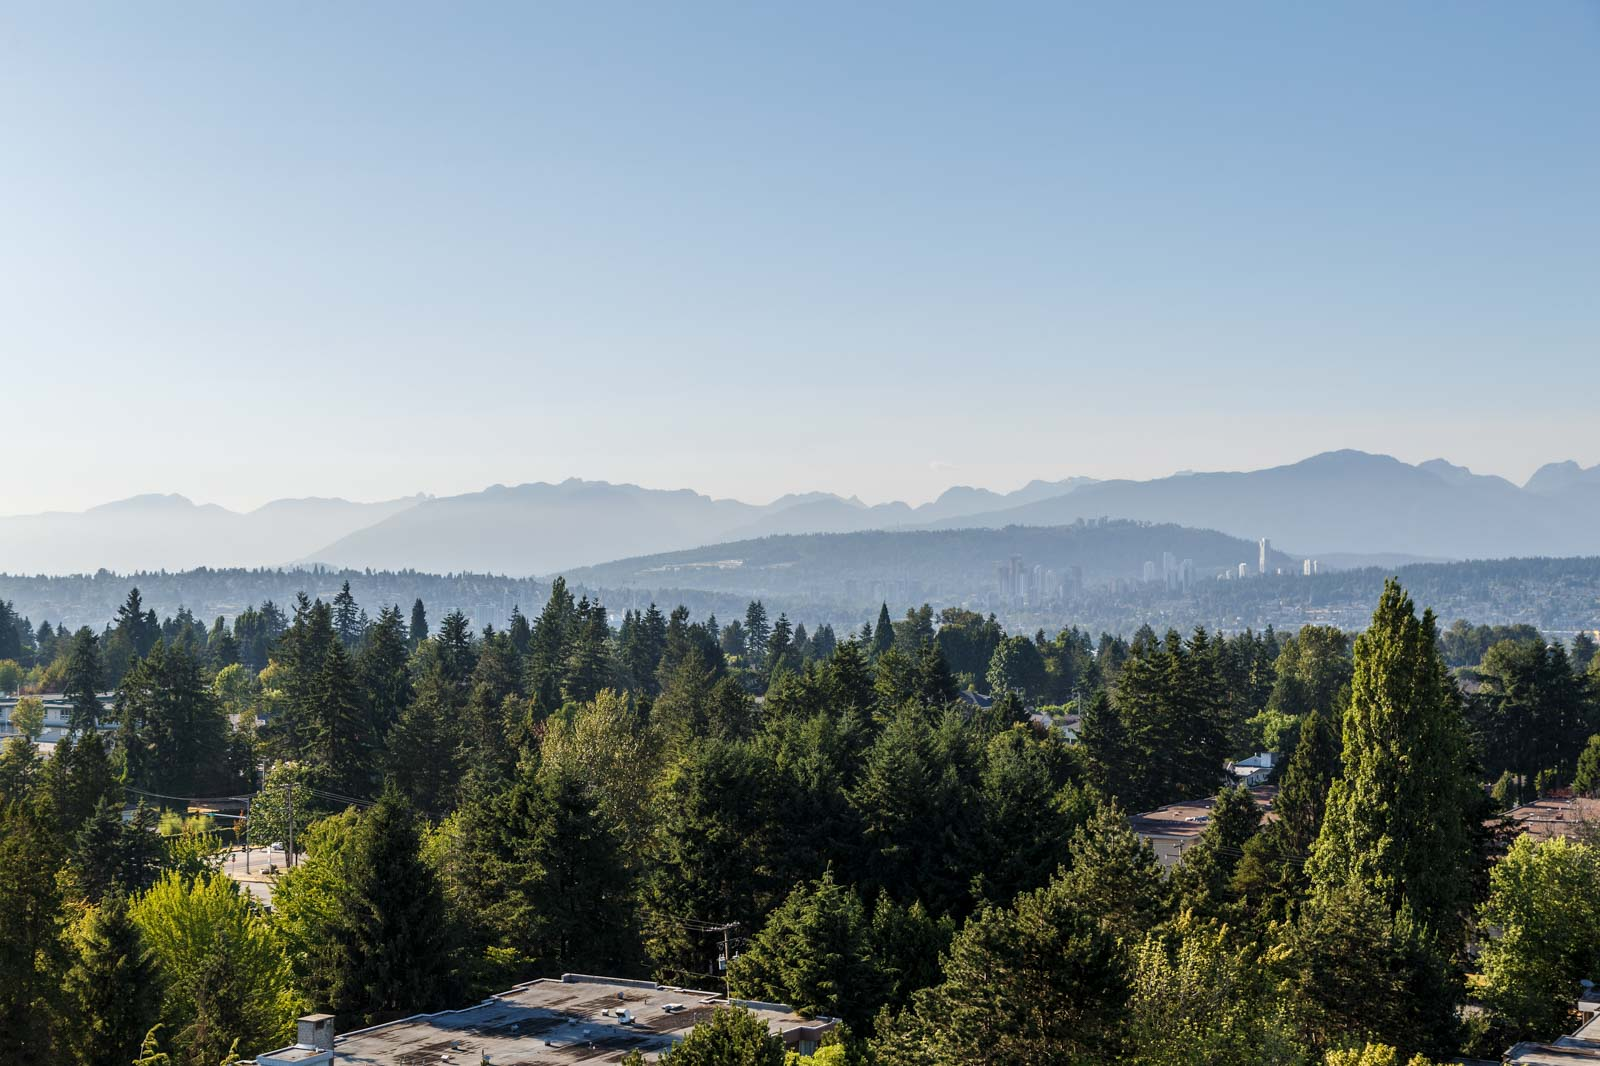 splendid view of bc's mountain range